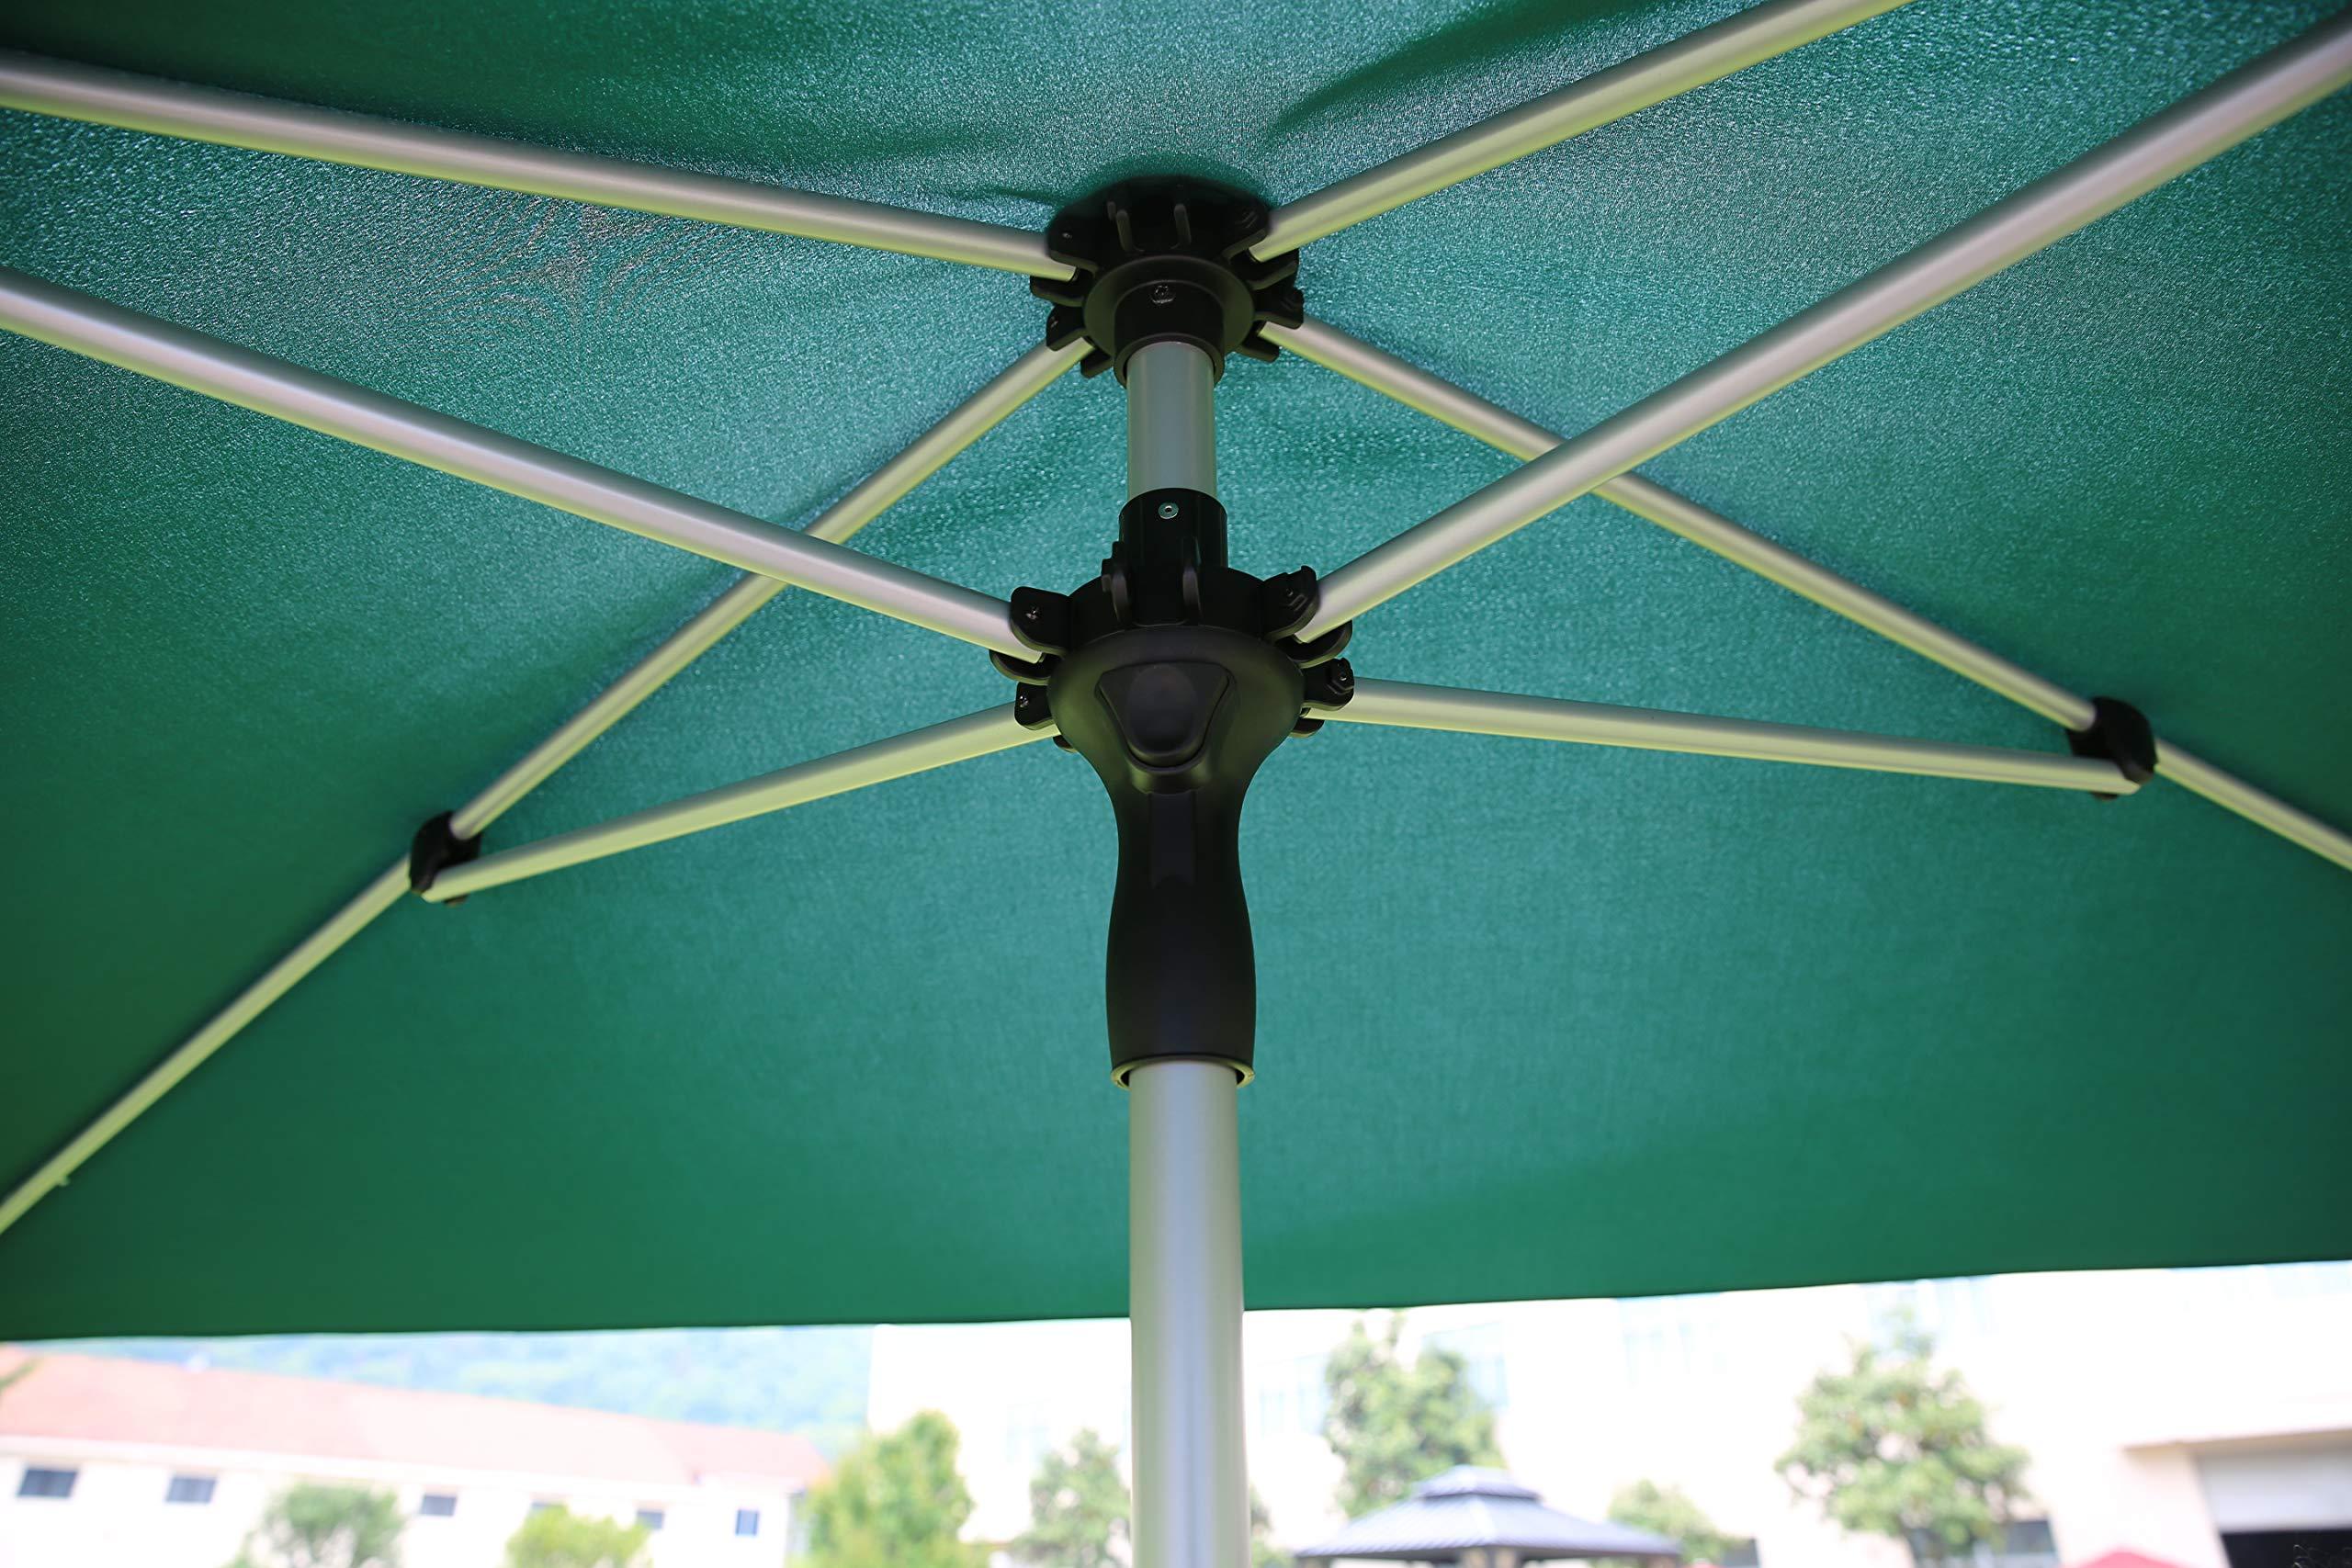 SORARA Porto Parasol Sombrilla Jardin, Verde, 300 x 200 cm (3 x 2 ...